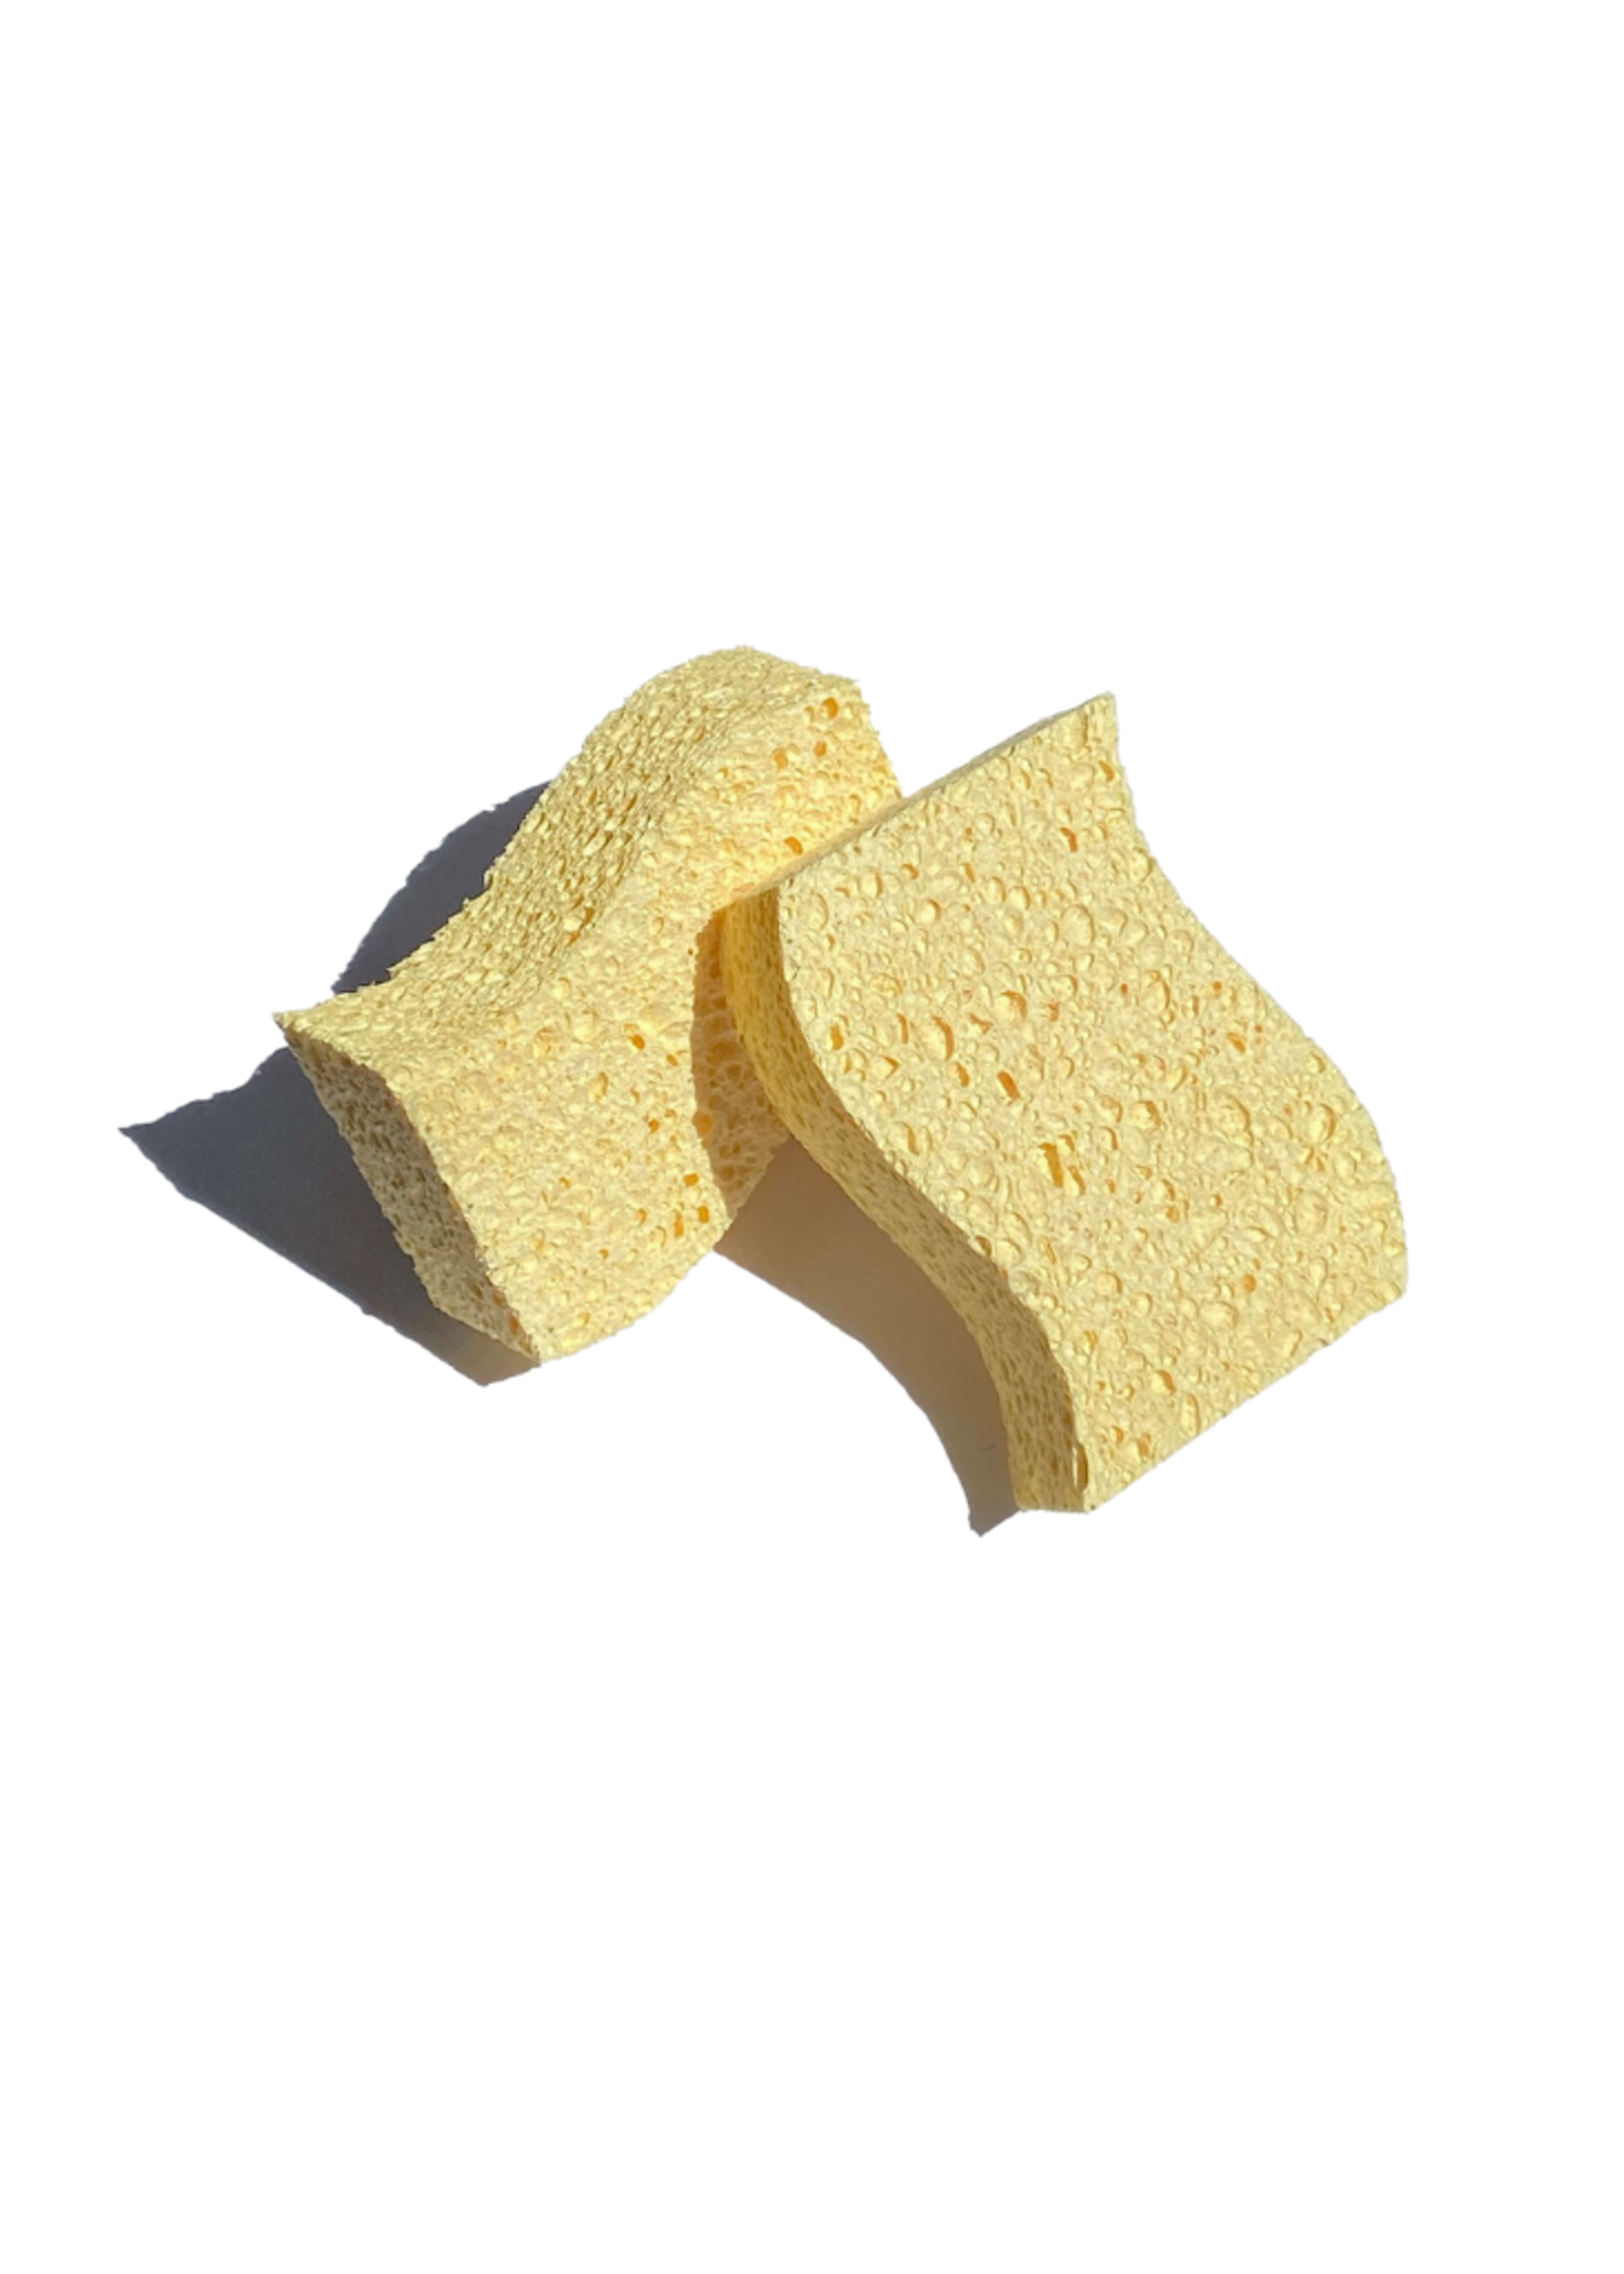 Zero Waste Club Biodegradable Kitchen Sponges - Pack of 2